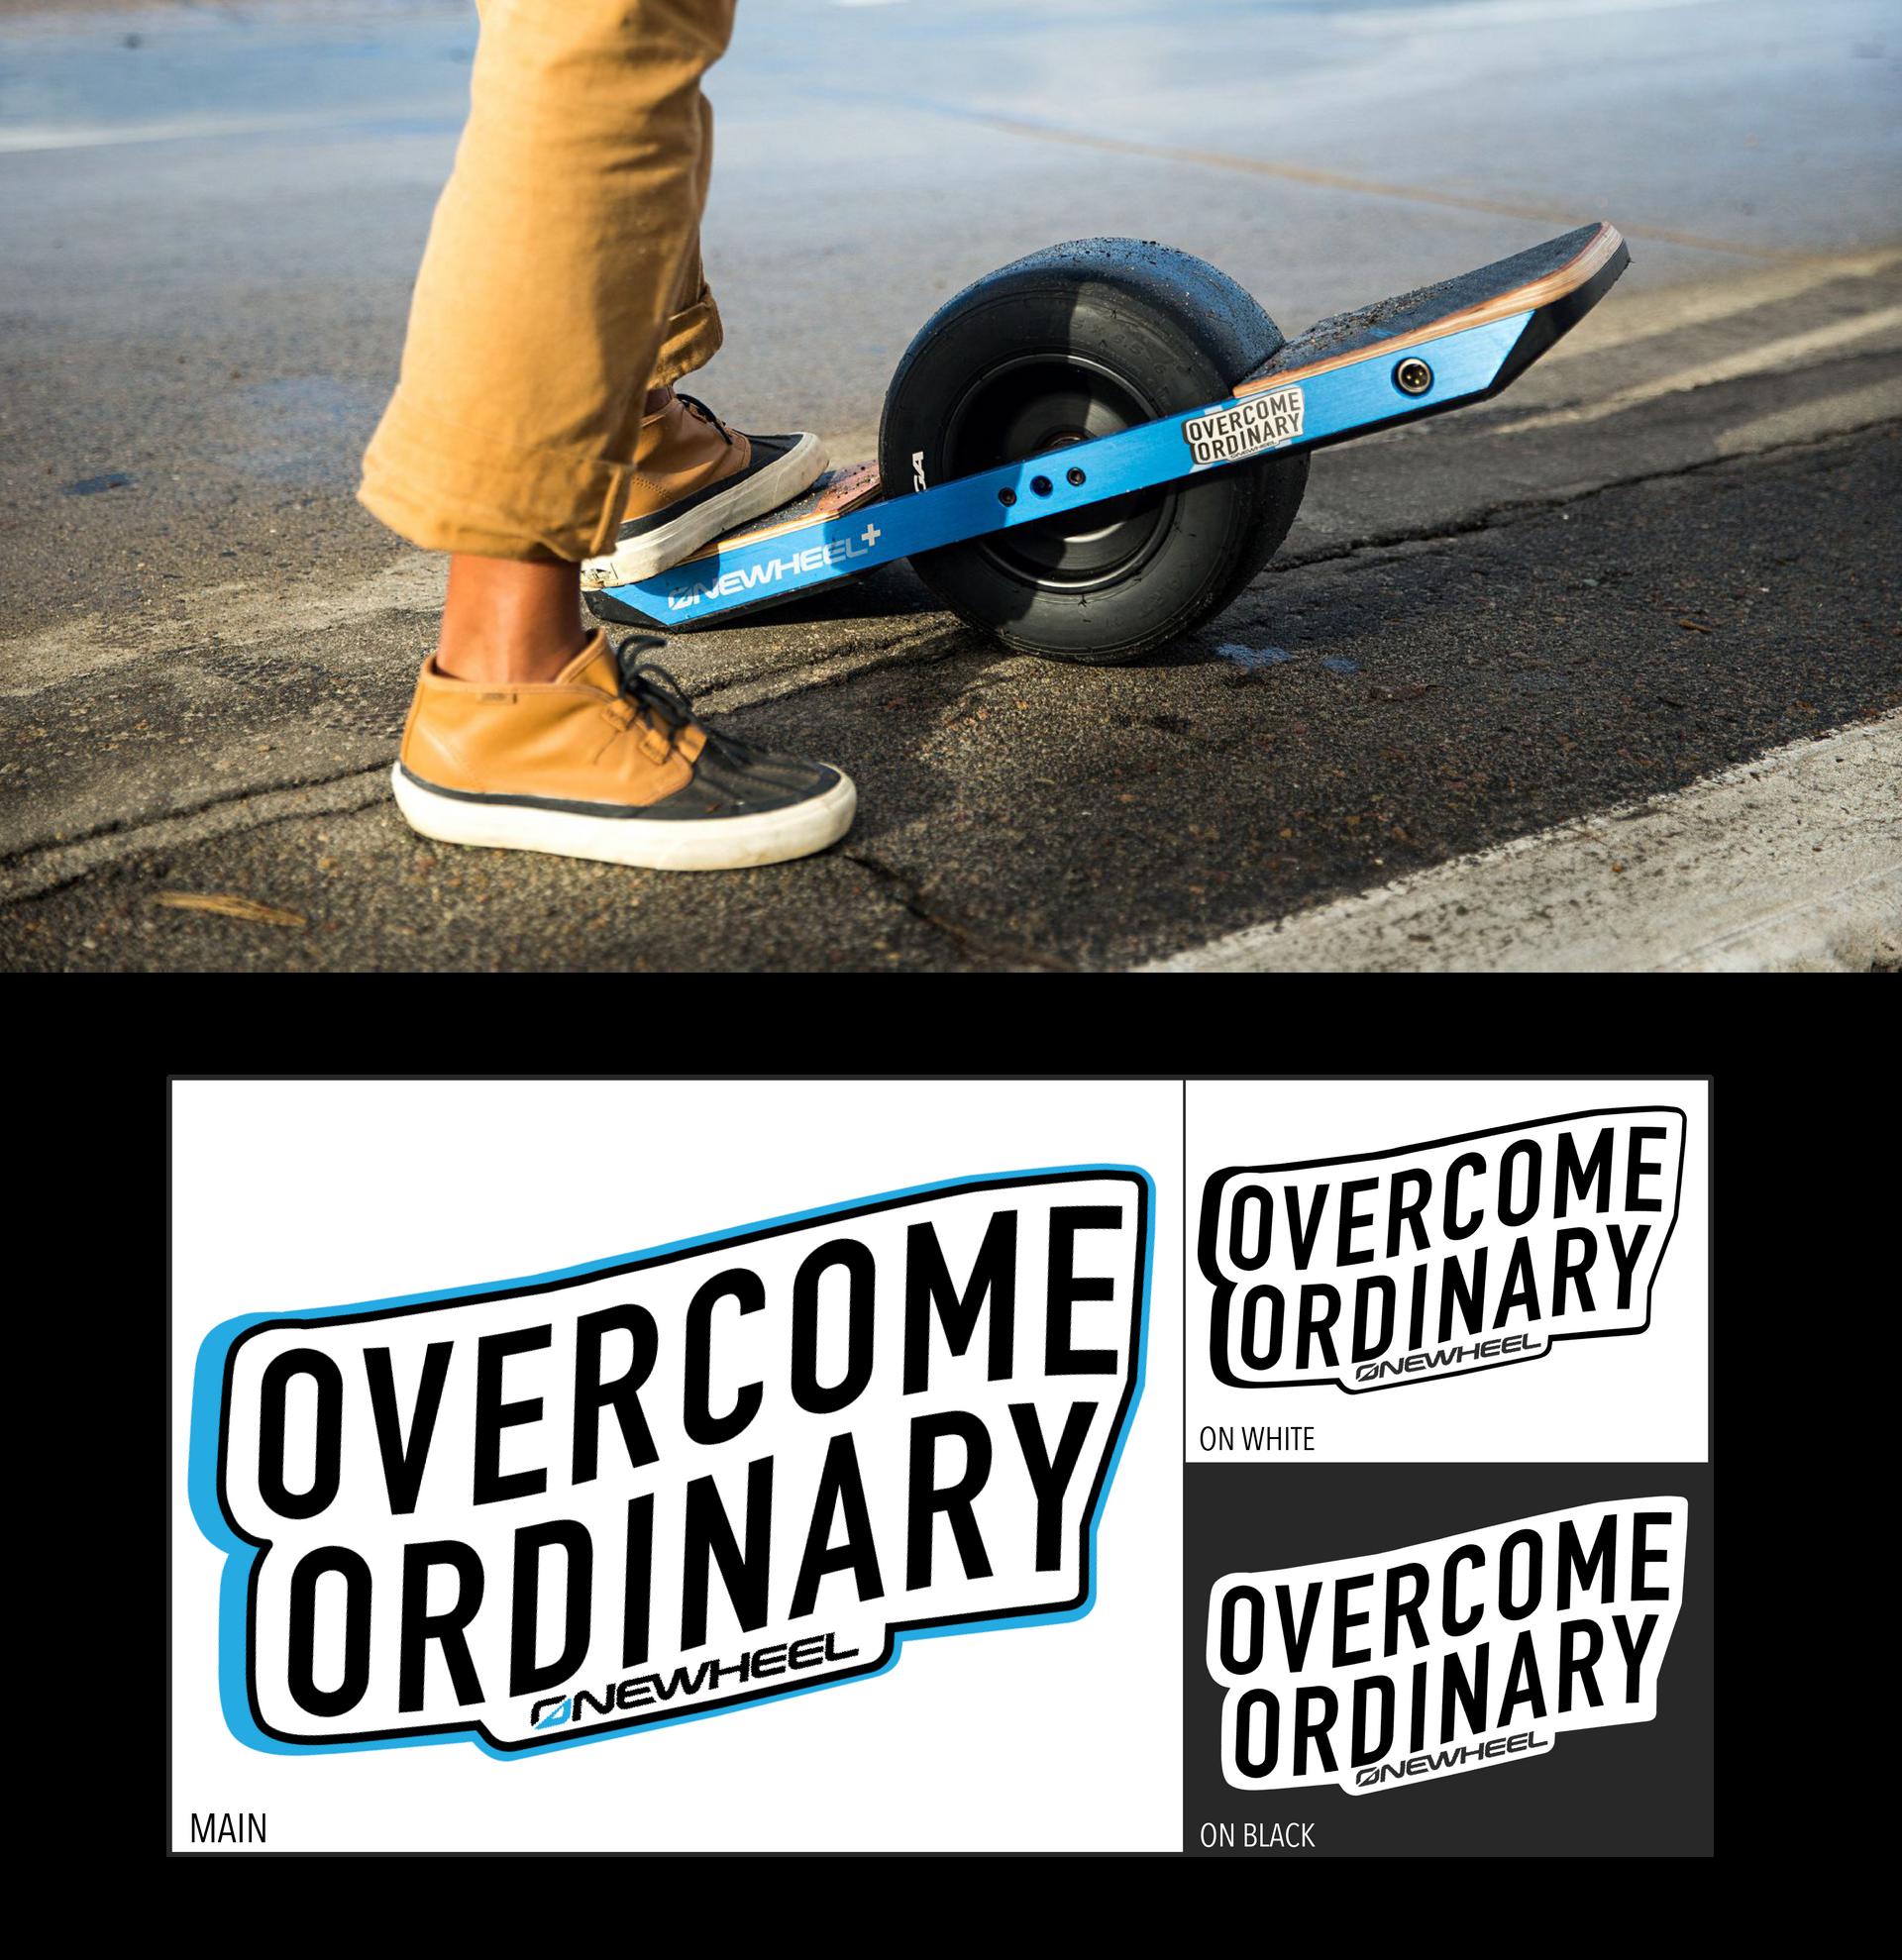 Overcome Ordinary Logo by Sarah Mac